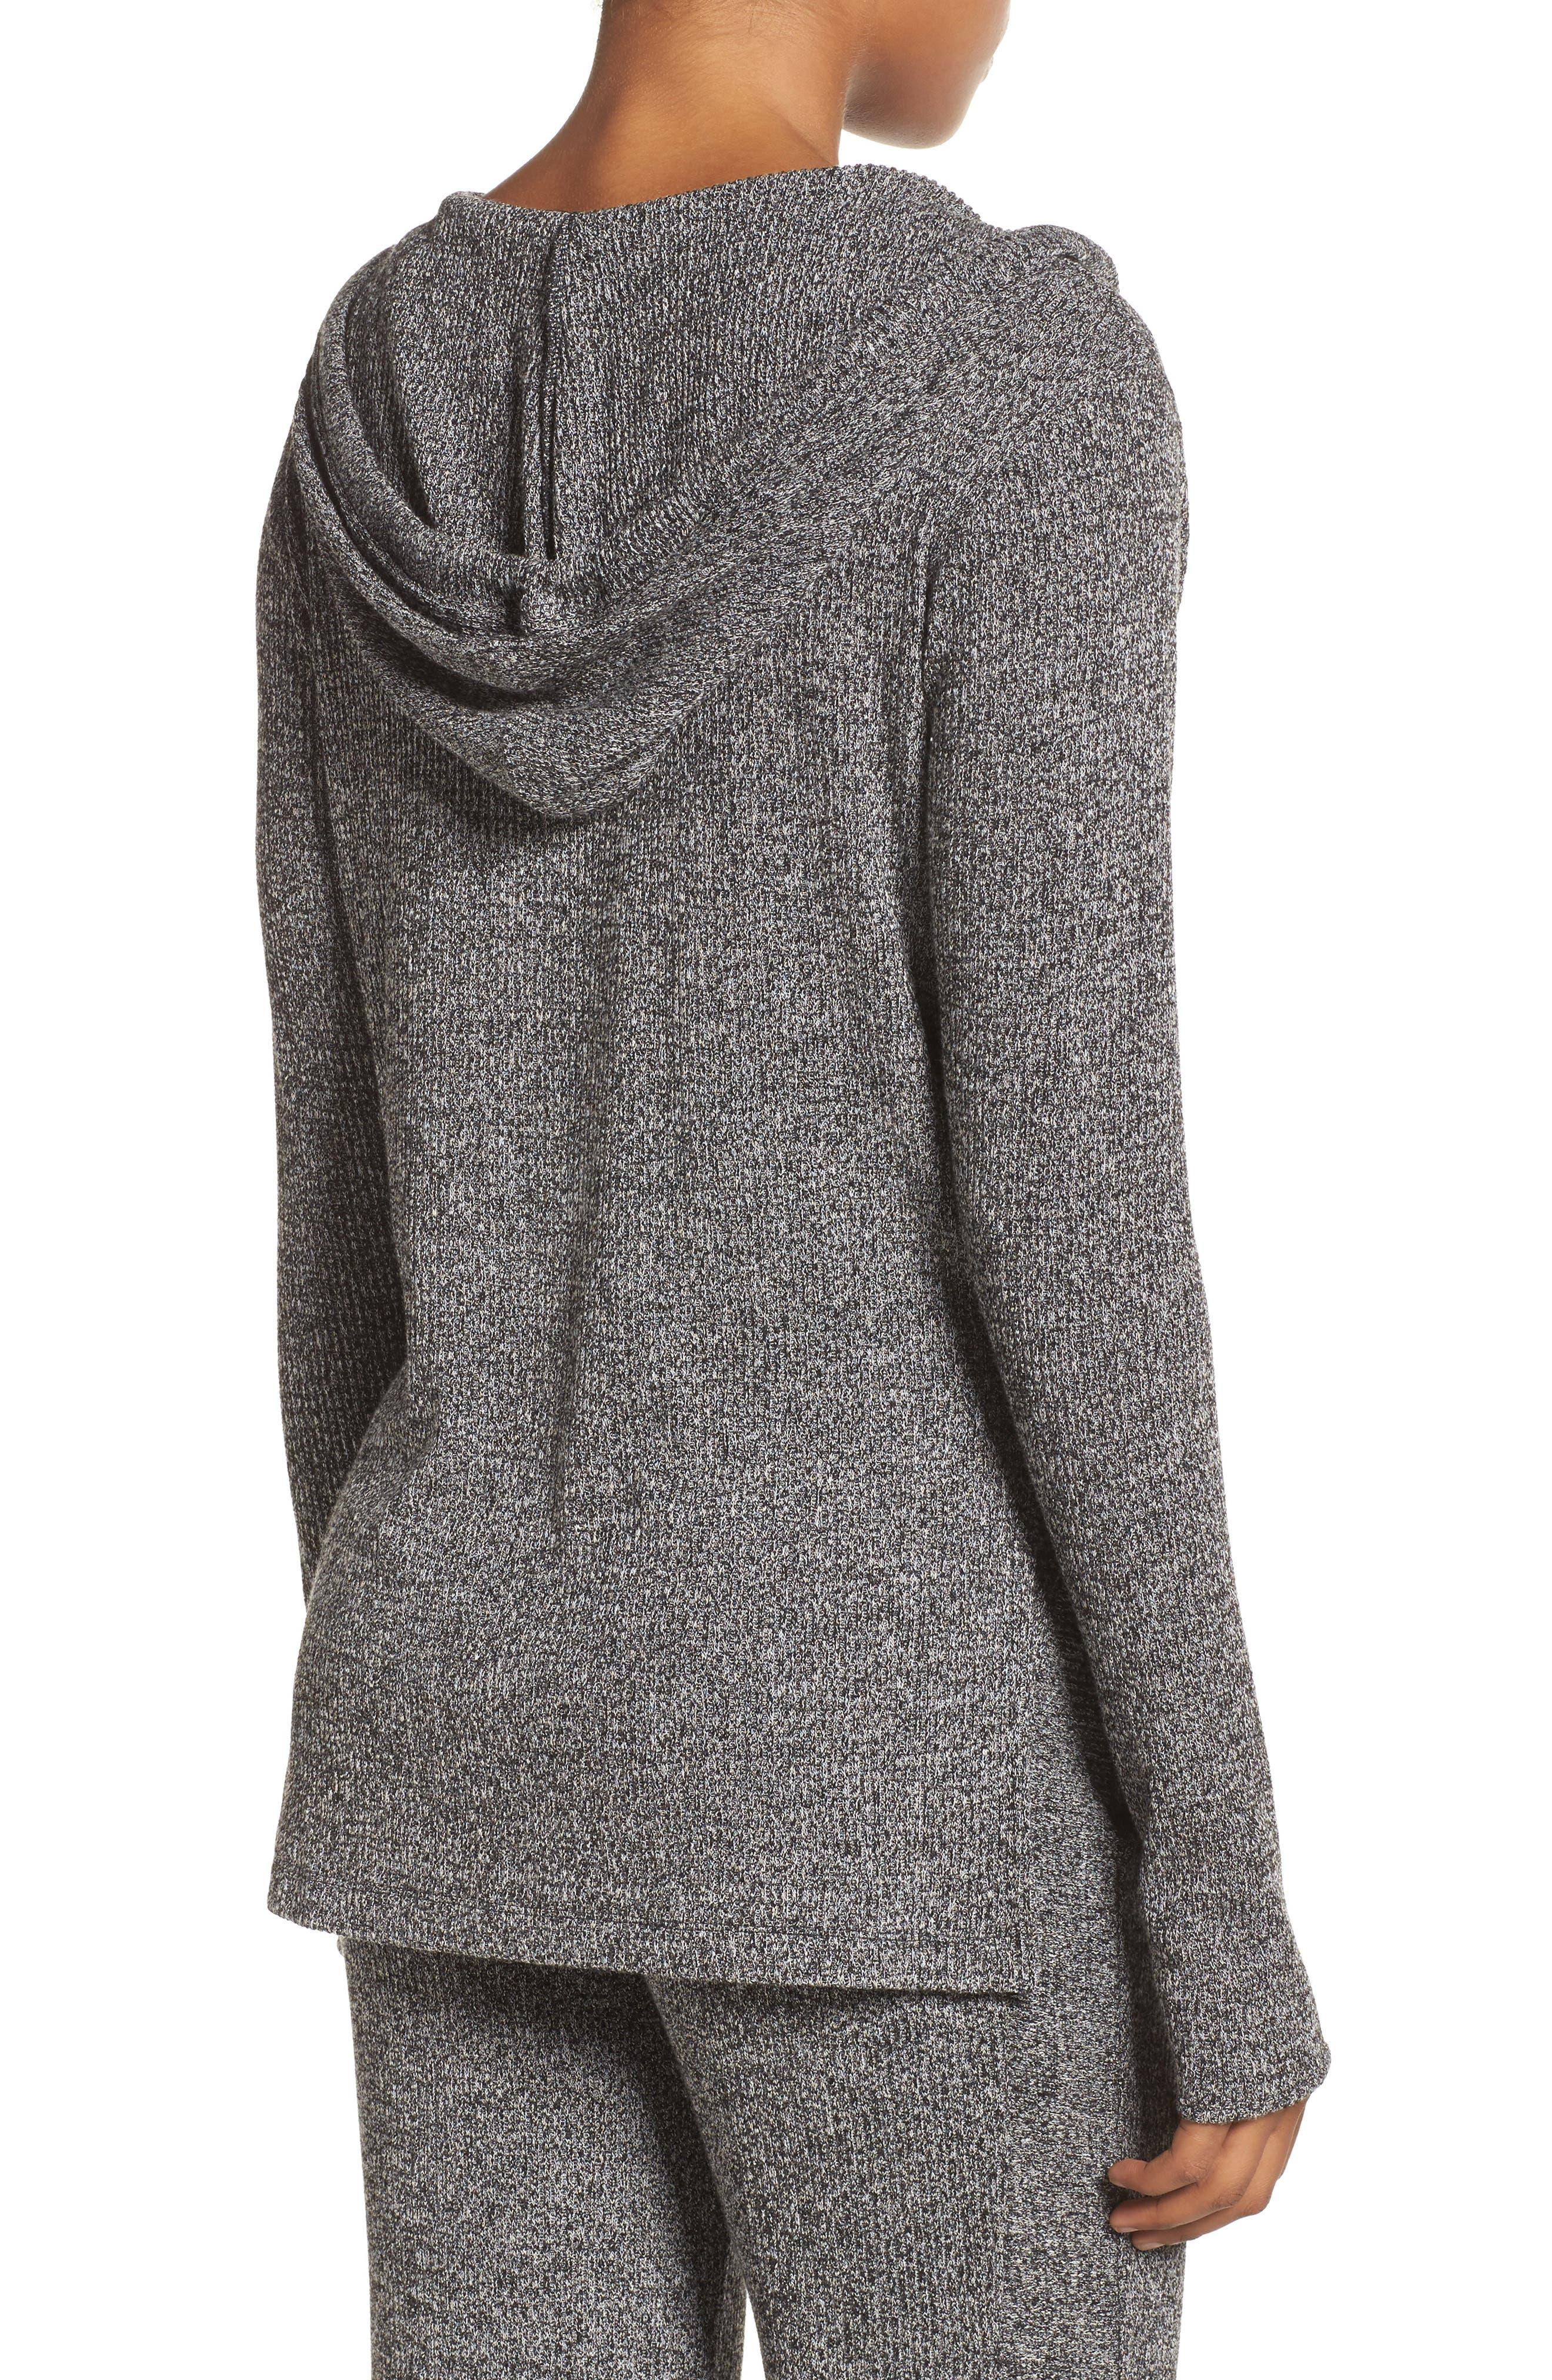 Alternate Image 2  - Zella Mantra Hooded Pullover Top